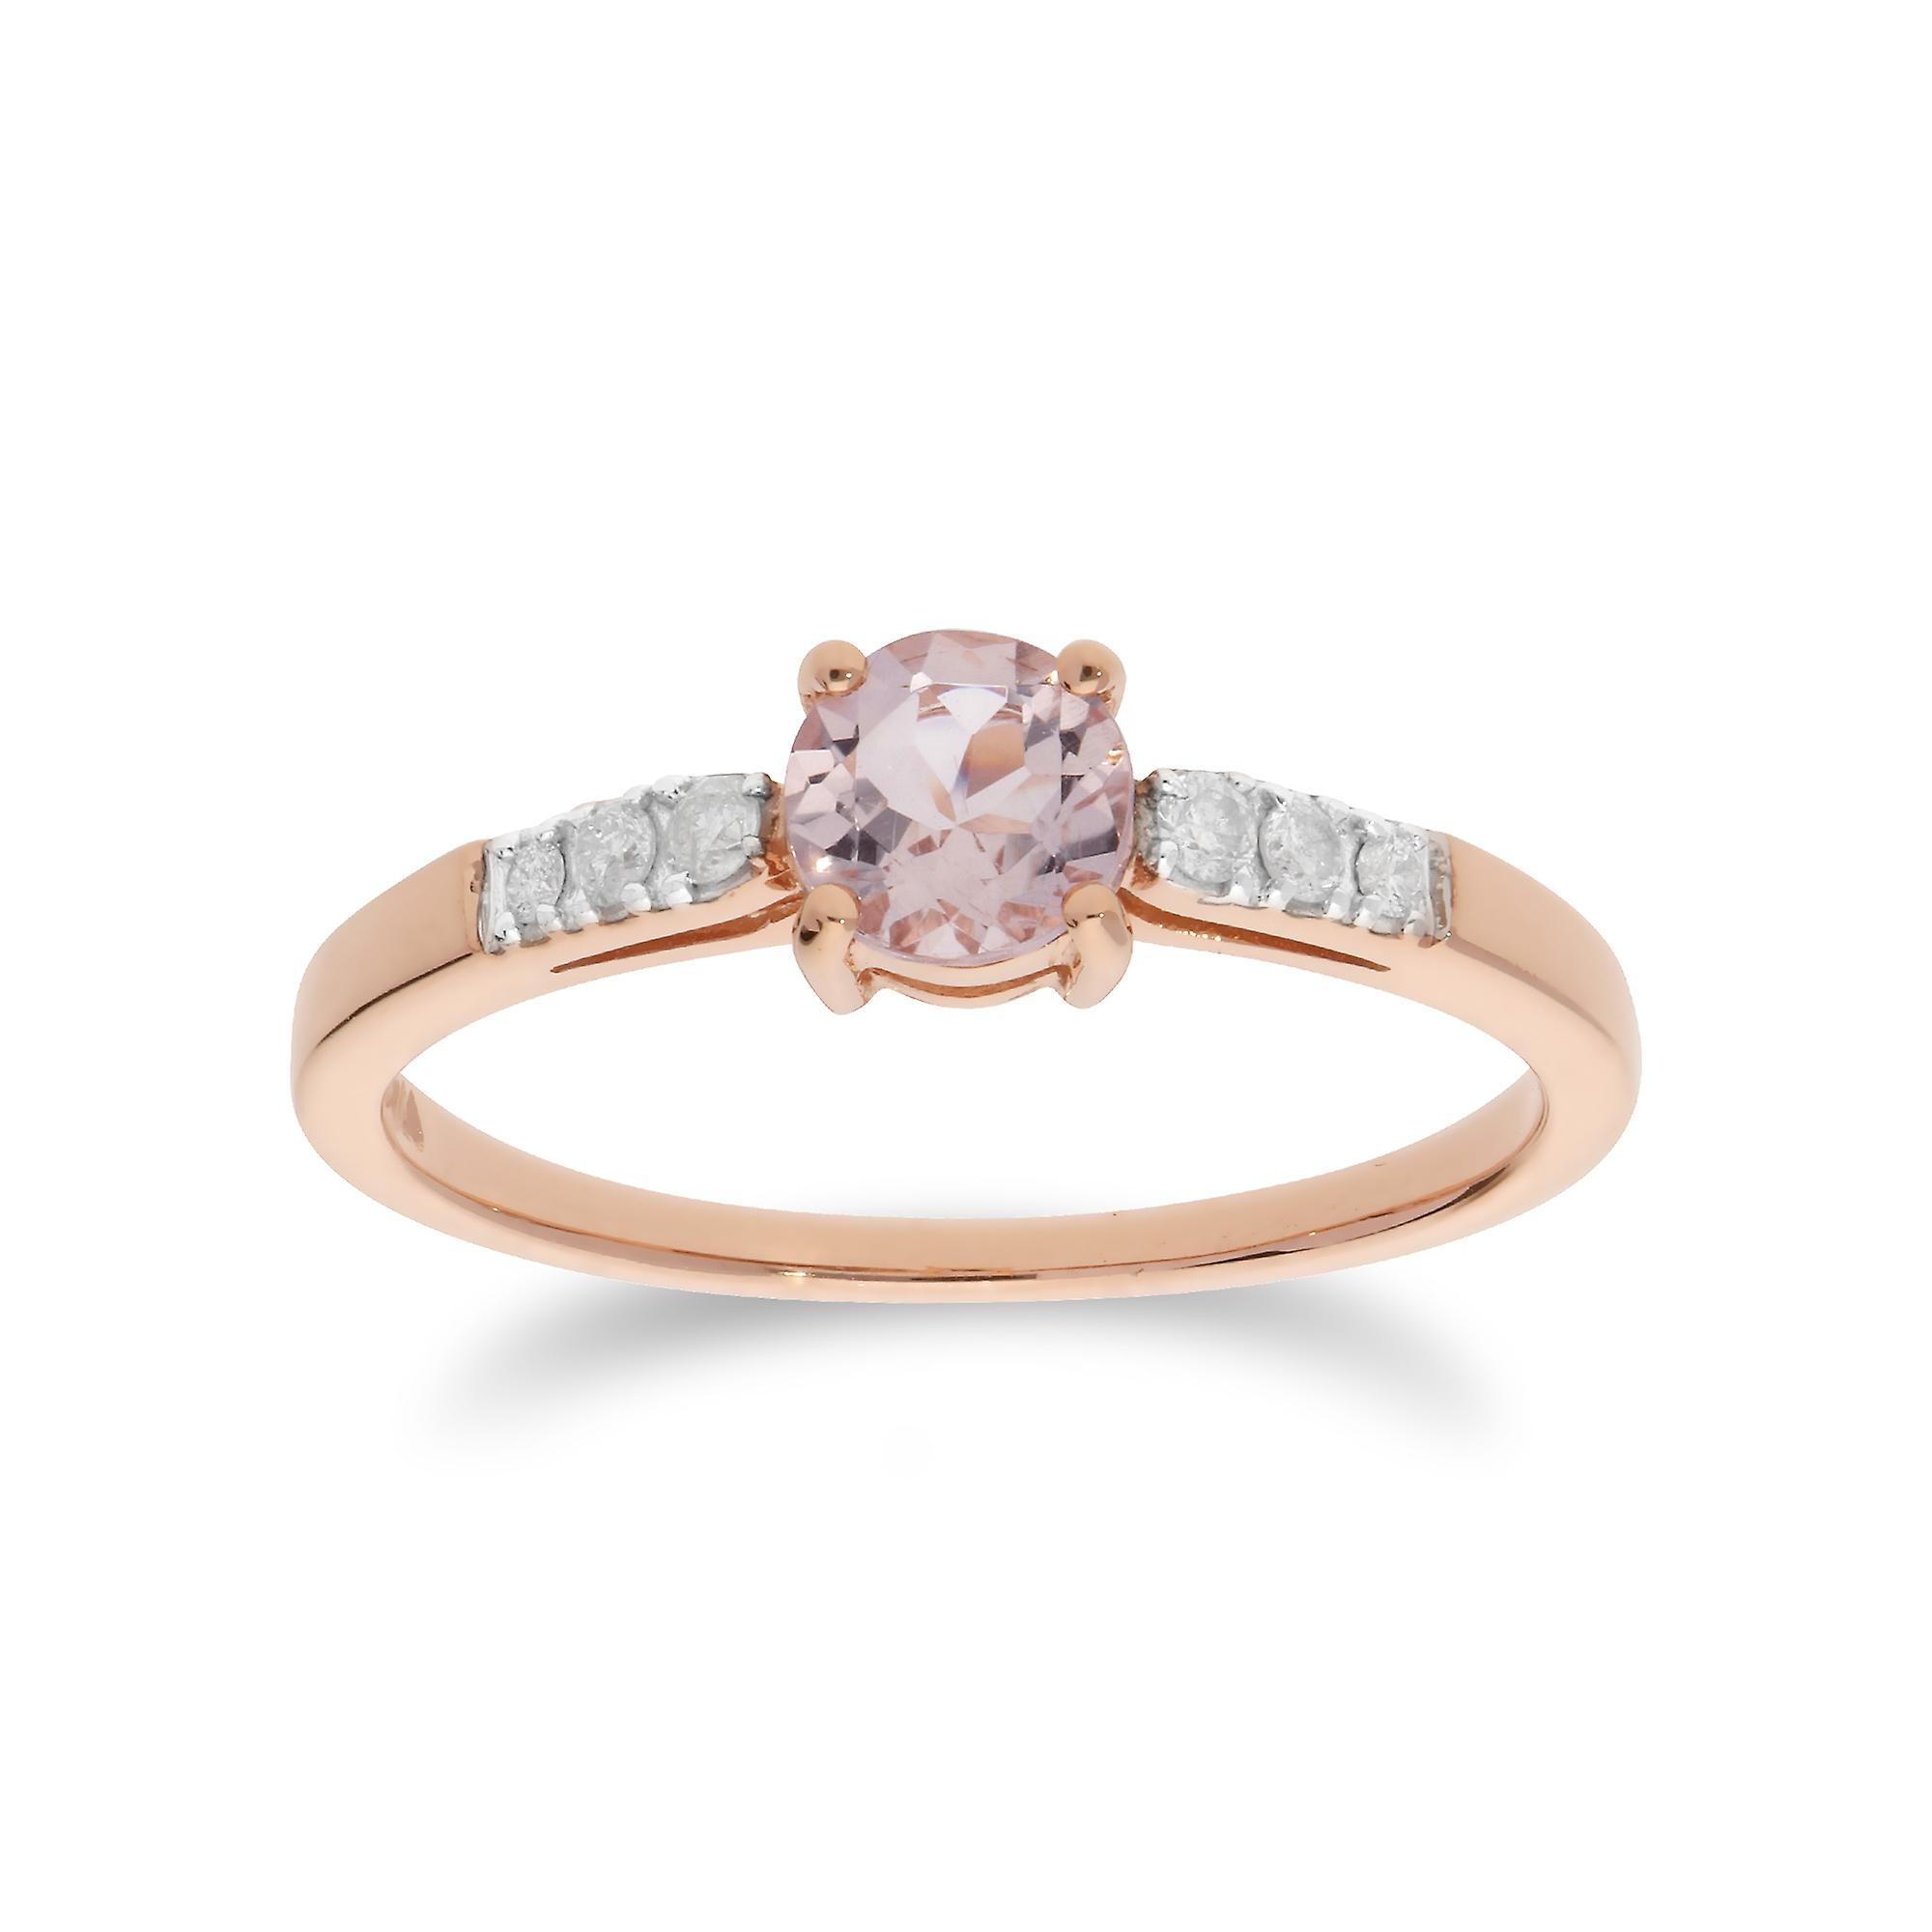 Gemondo 9ct Rose Gold 0.41ct Morganite & Diamond Oval Cut Solitaire Ring